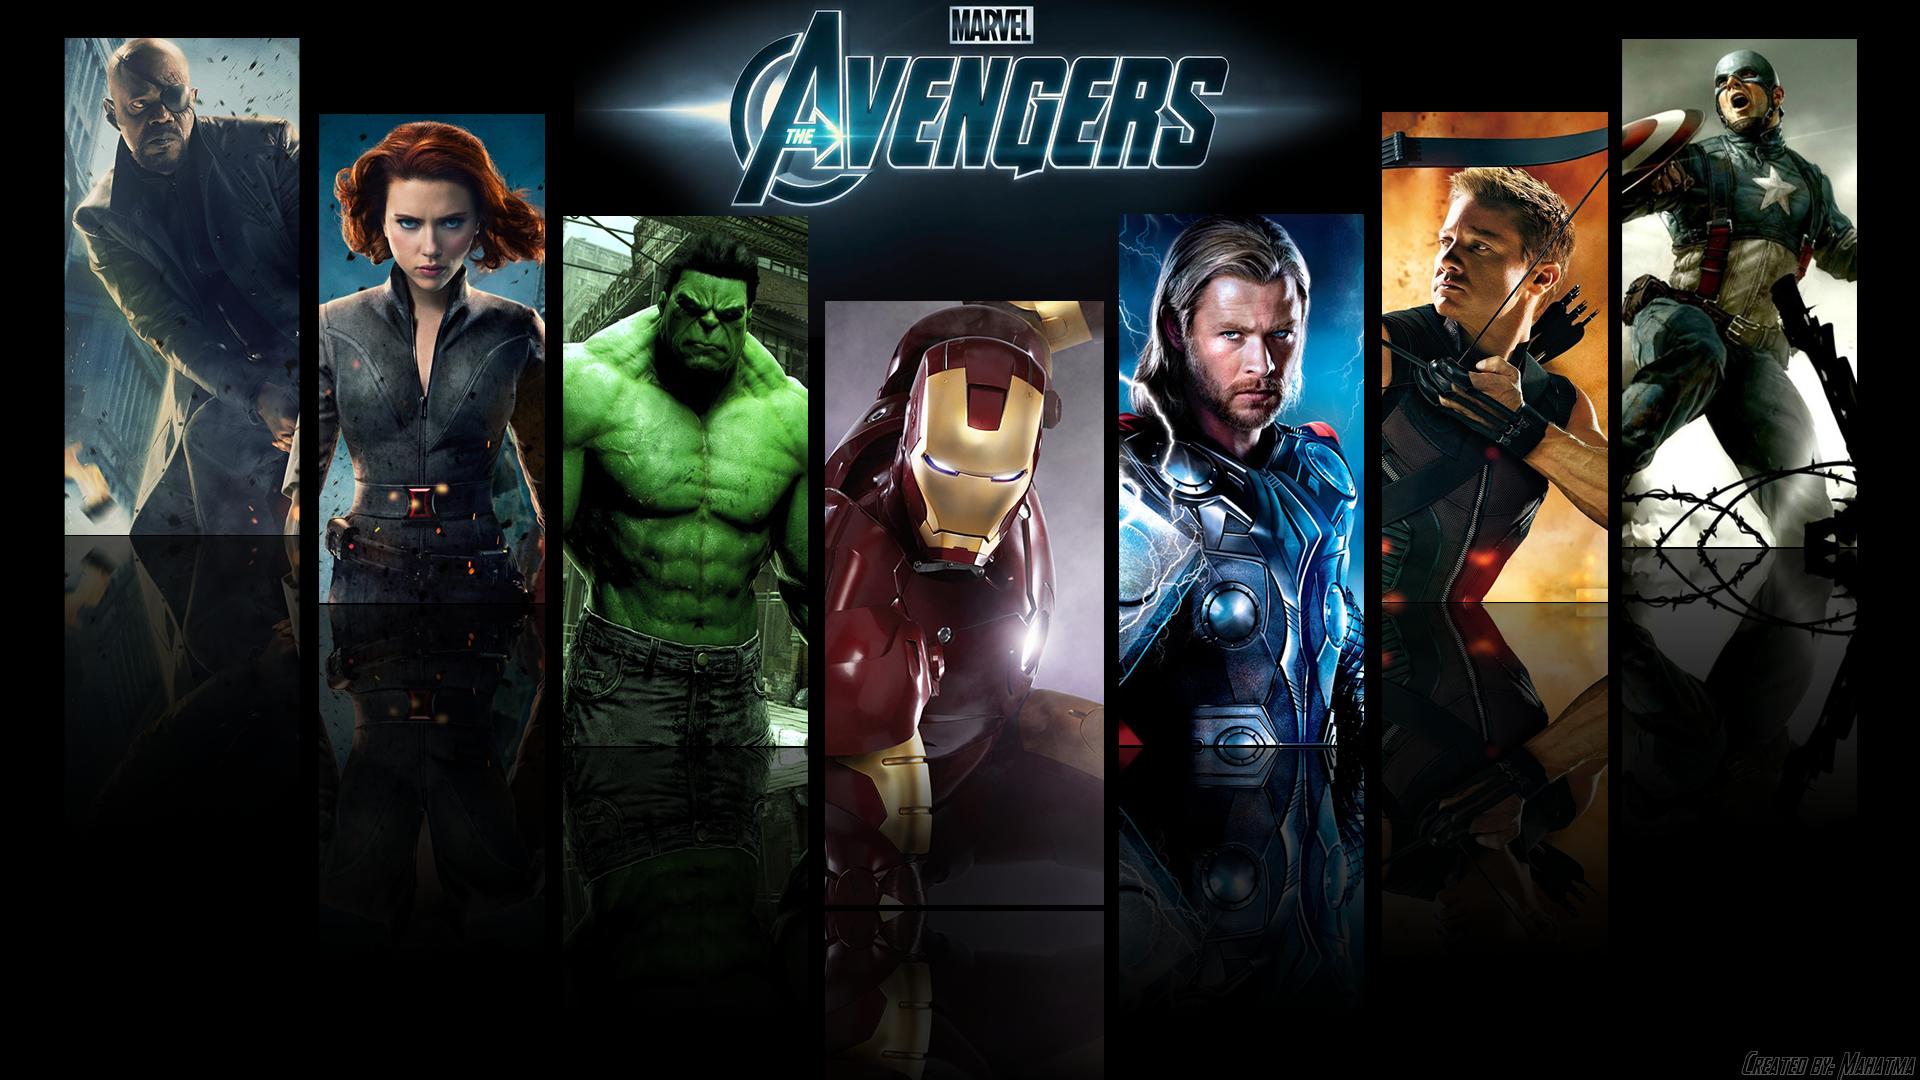 Black-Widow-Captain-America-The-Winter-Soldier-HD-desktop-wallpaper-wpc5802885